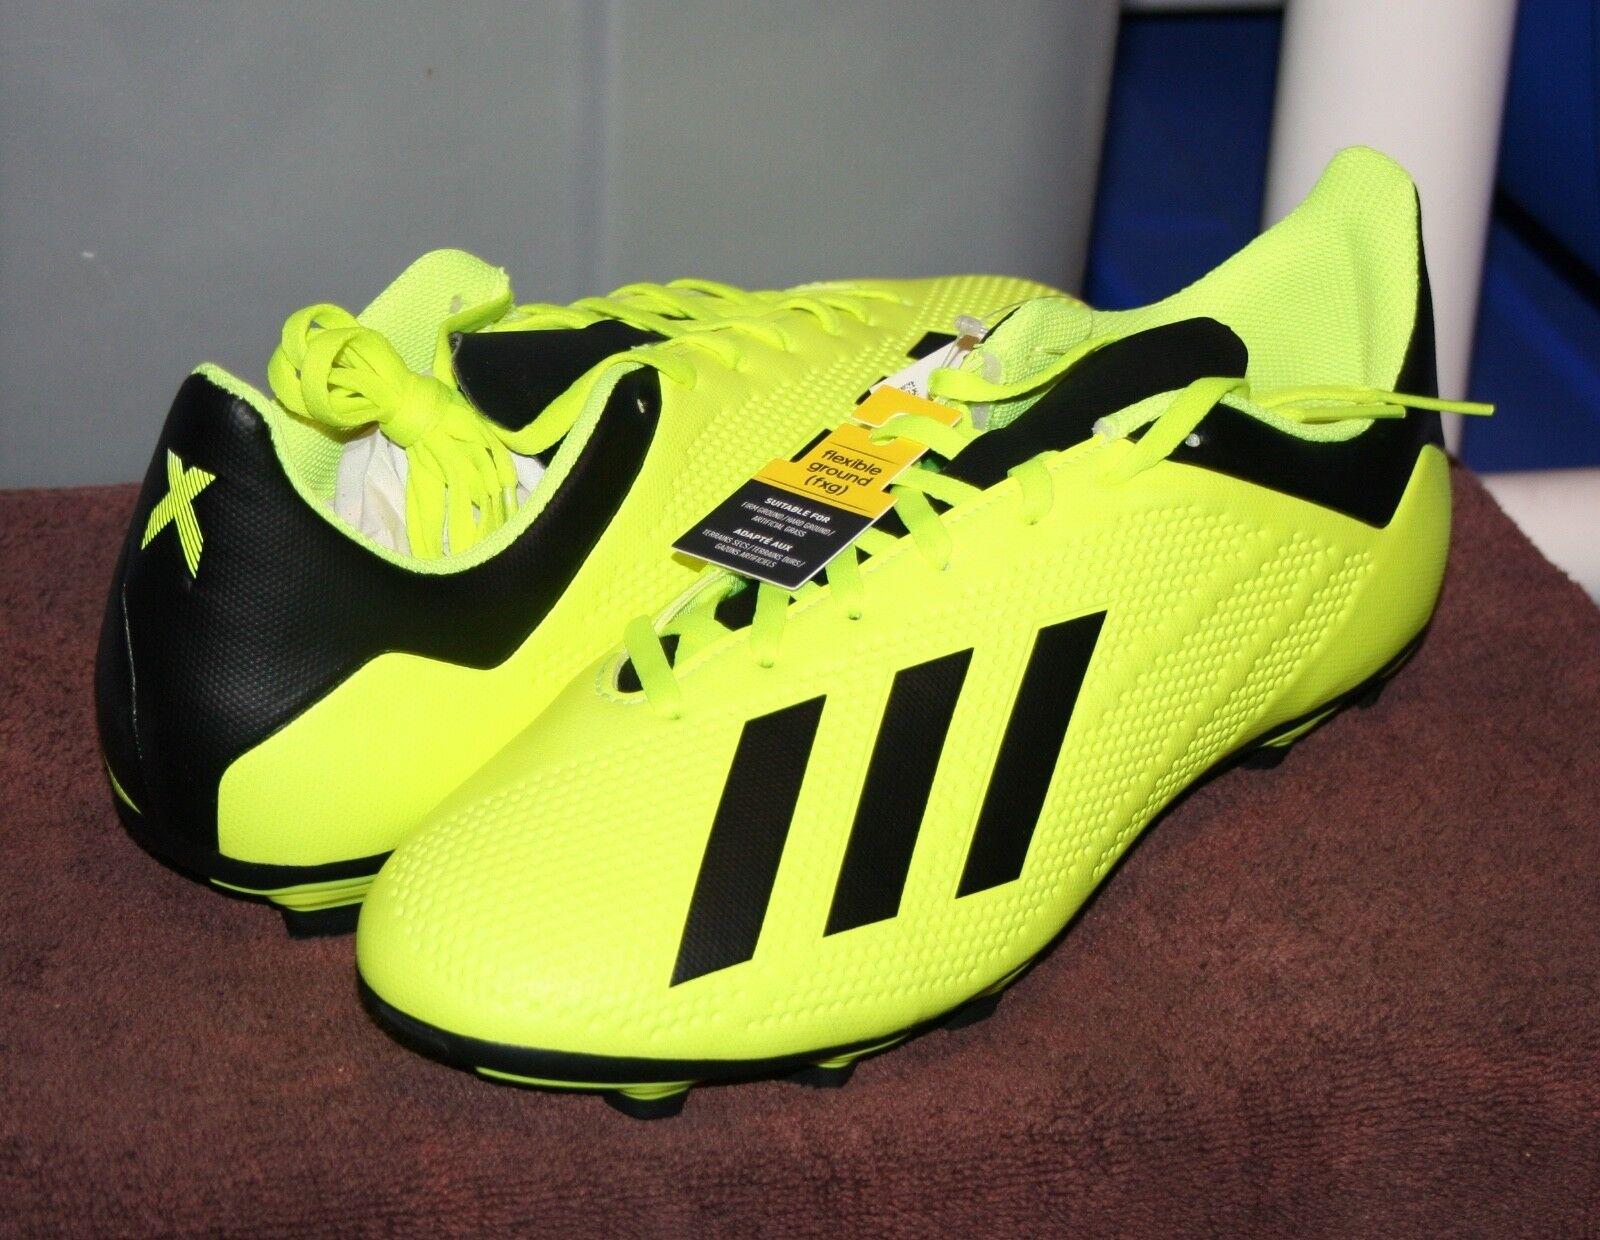 ADIDAS X 18.4 FG SZ 6.5 Men's Soccer Cleats Yellow